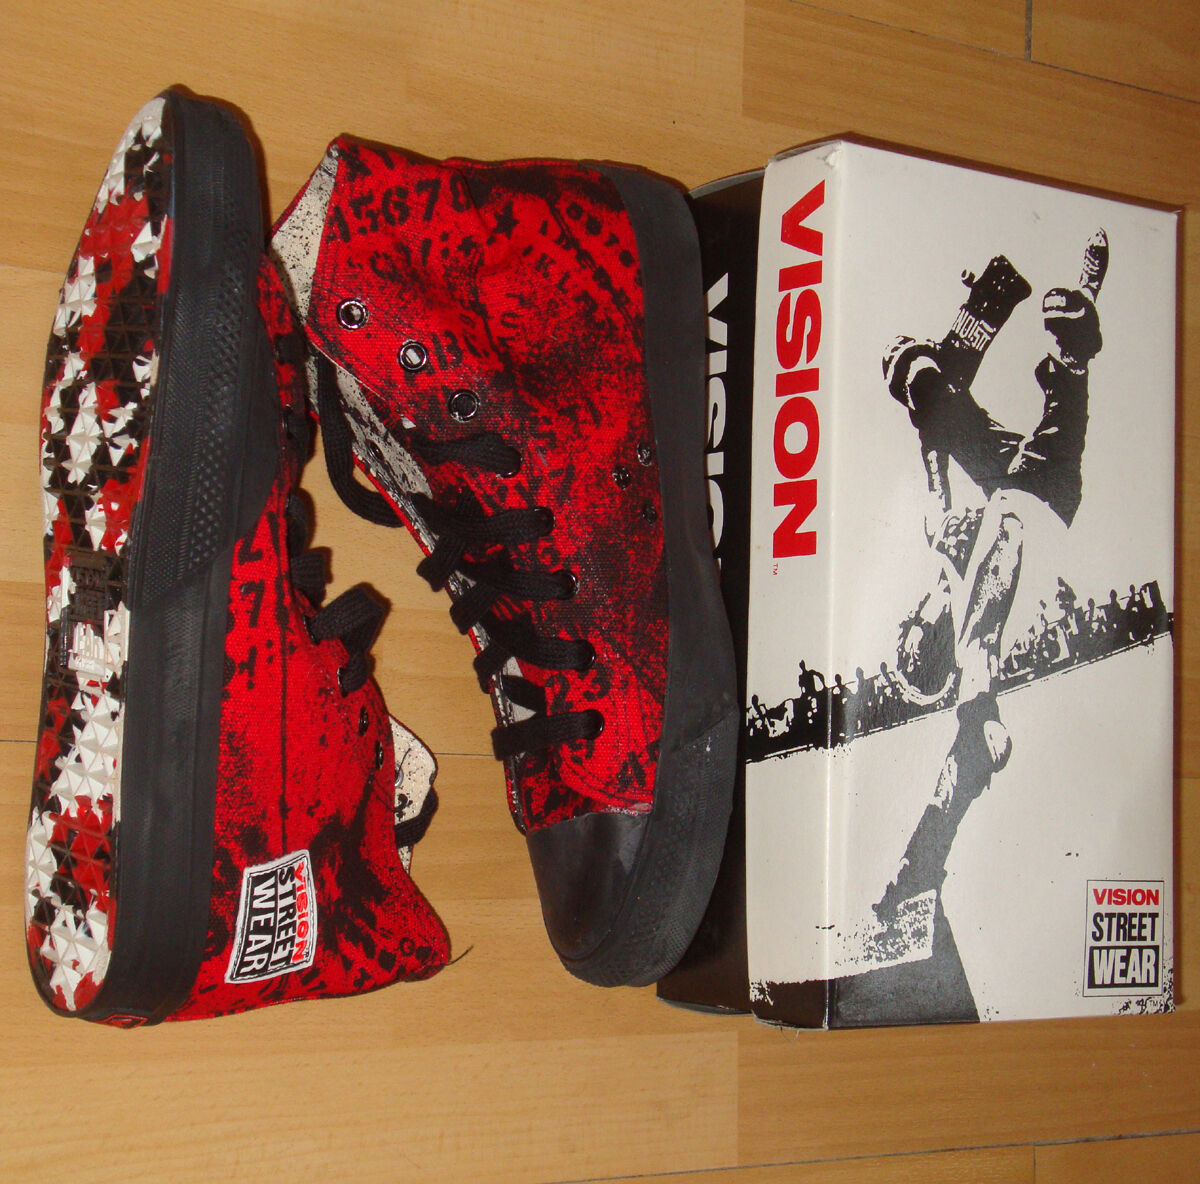 Vision Street Wear Skateboard Schuhe alphabarb 6 USA UK 7 USA 6 80s Jahre alte Schule ccac21